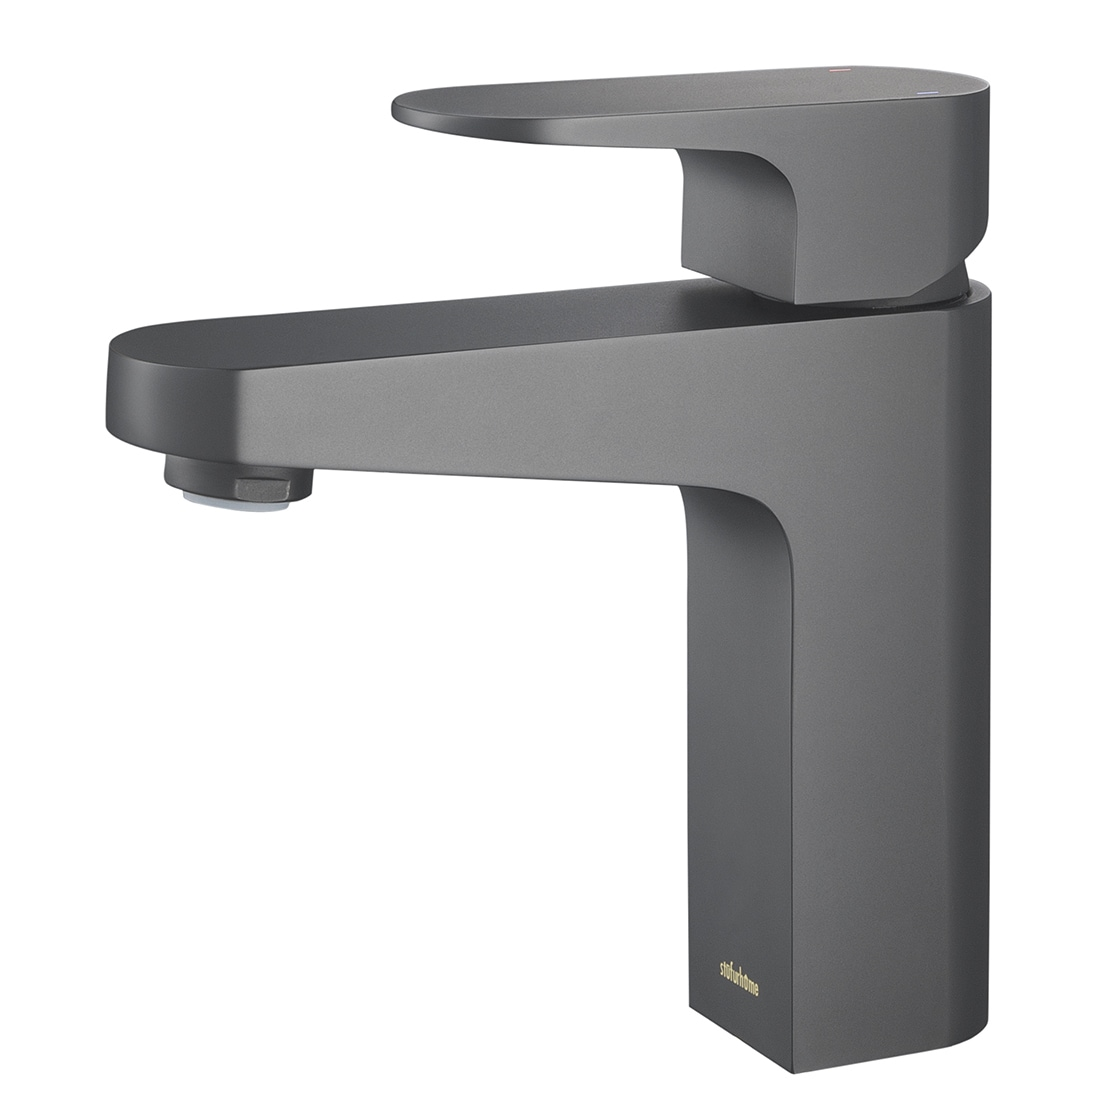 matte black faucet. Shop Stufurhome Jackson 1.2 GPM Single Hole Single-lever Matte Black Faucet - Free Shipping Today Overstock.com 10406491